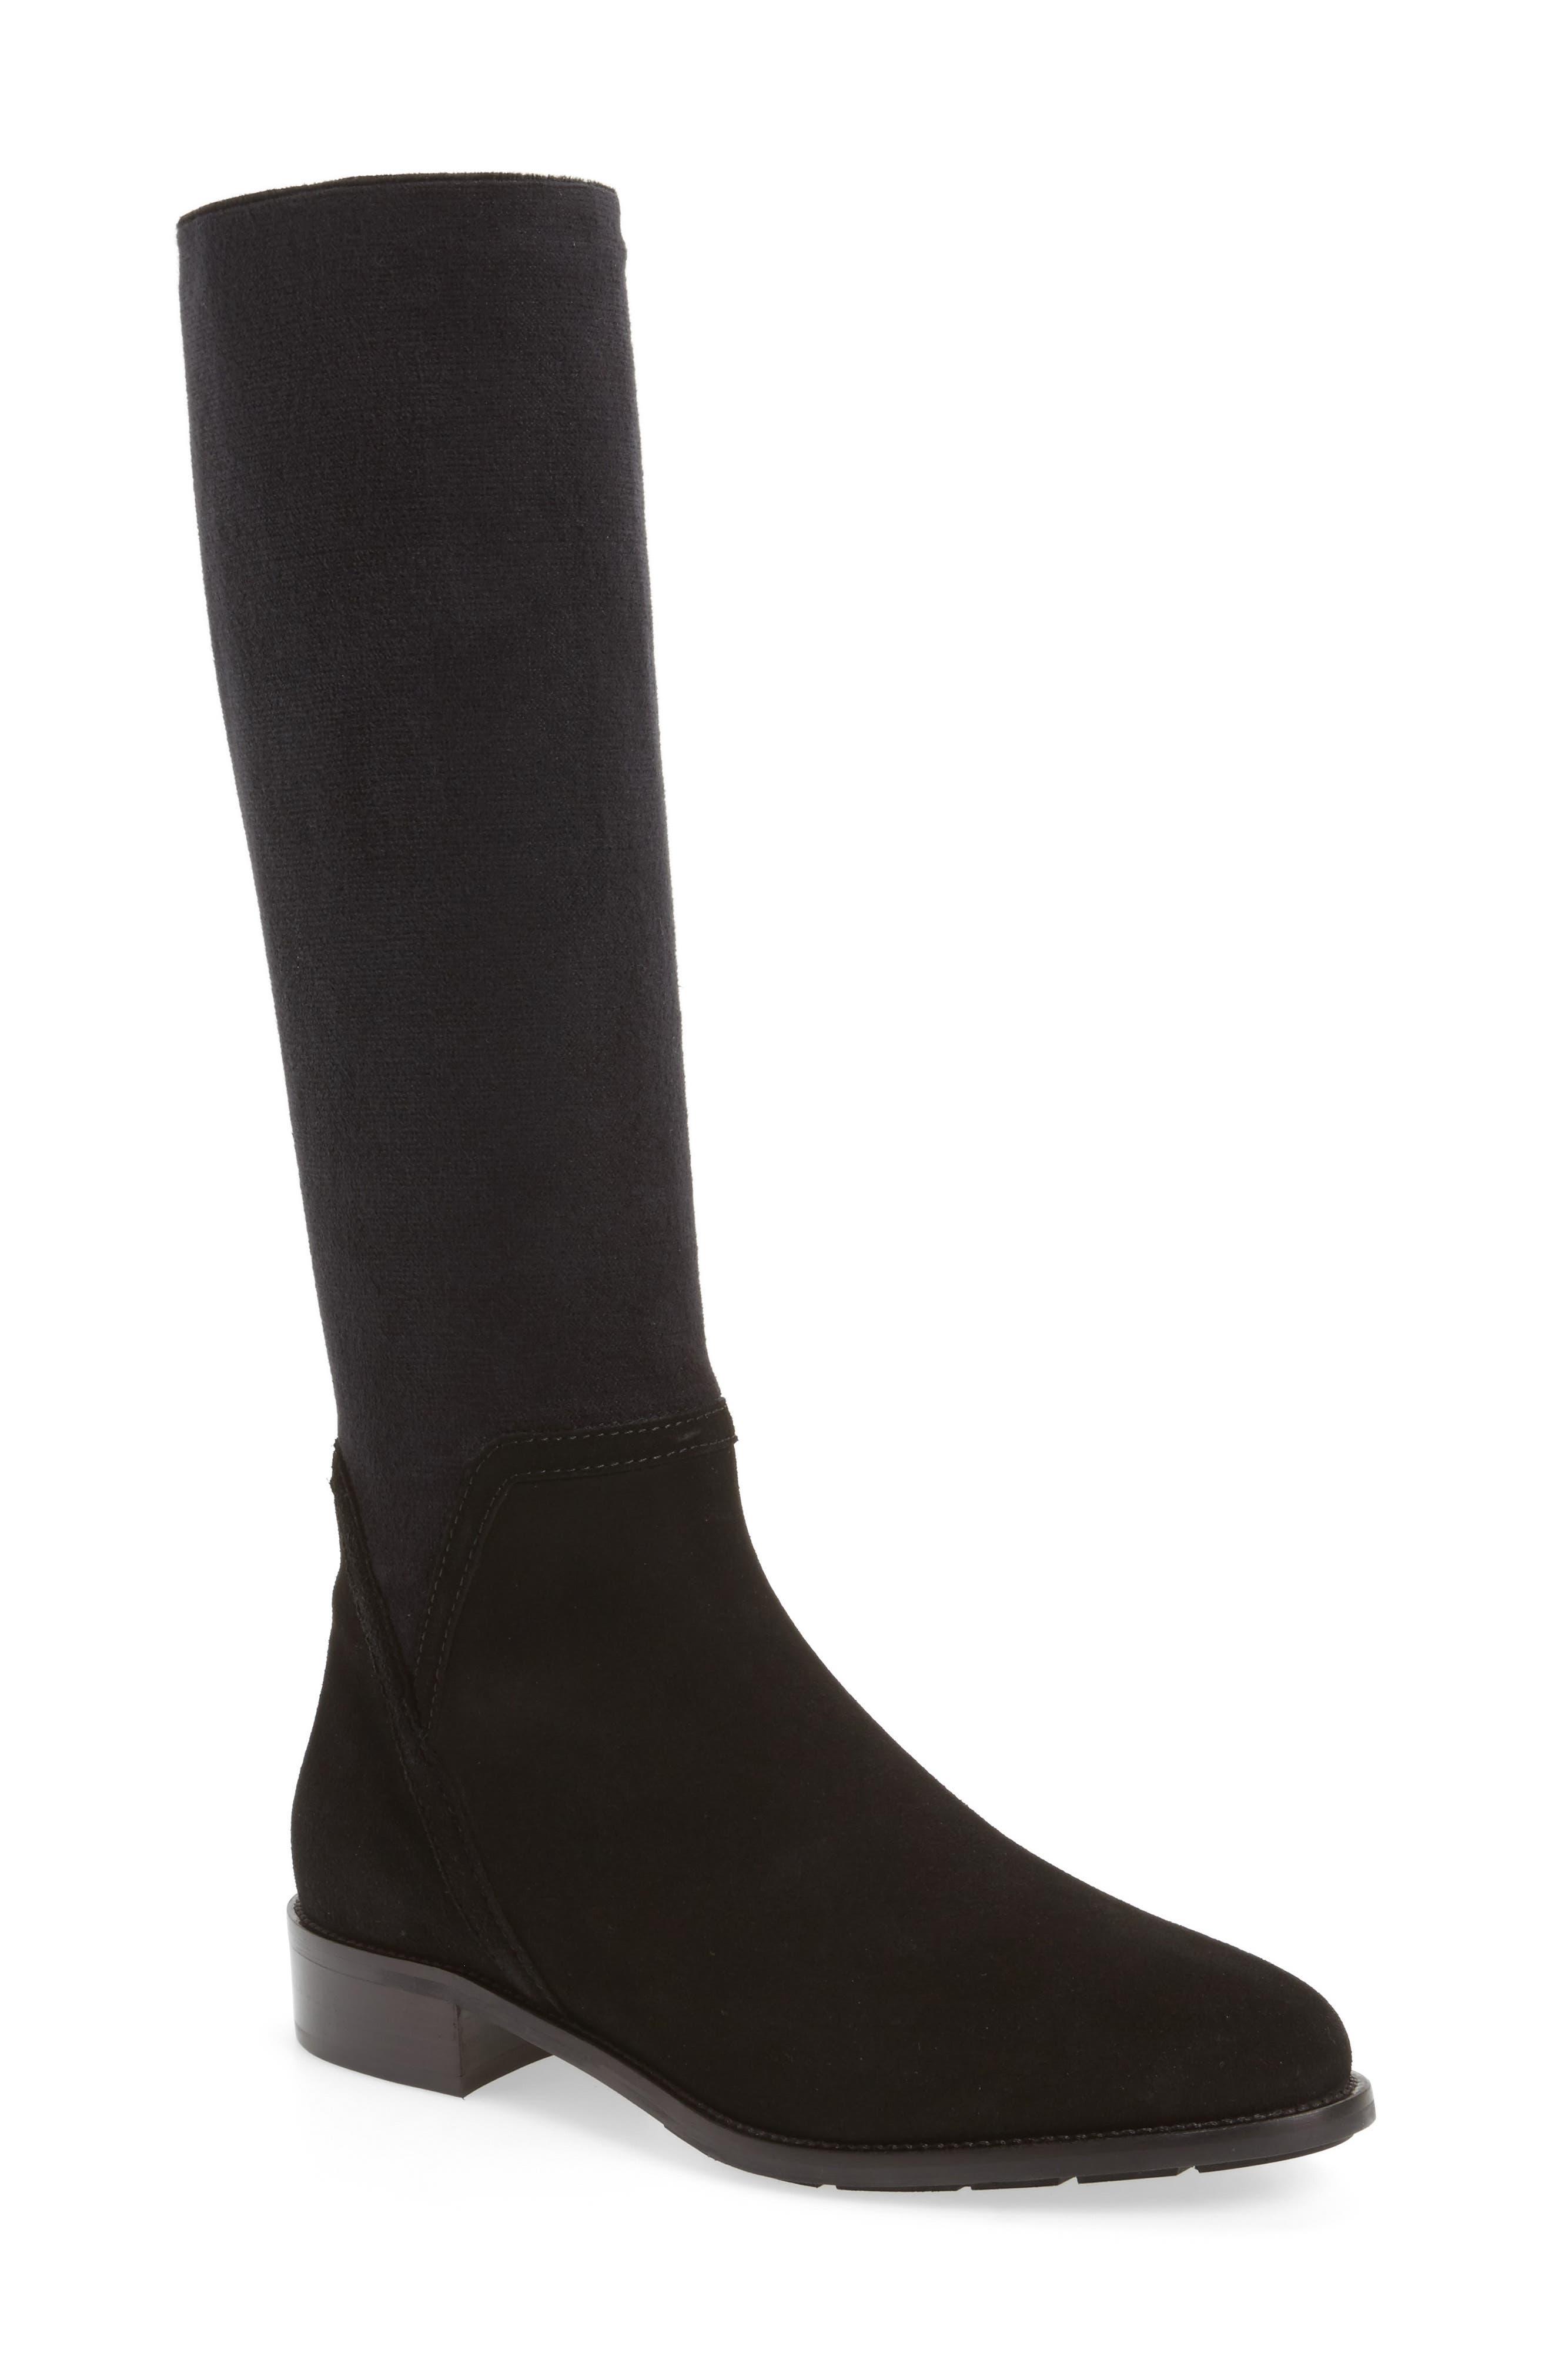 Main Image - Aquatalia Nicolette Knee High Weatherproof Boot (Women)